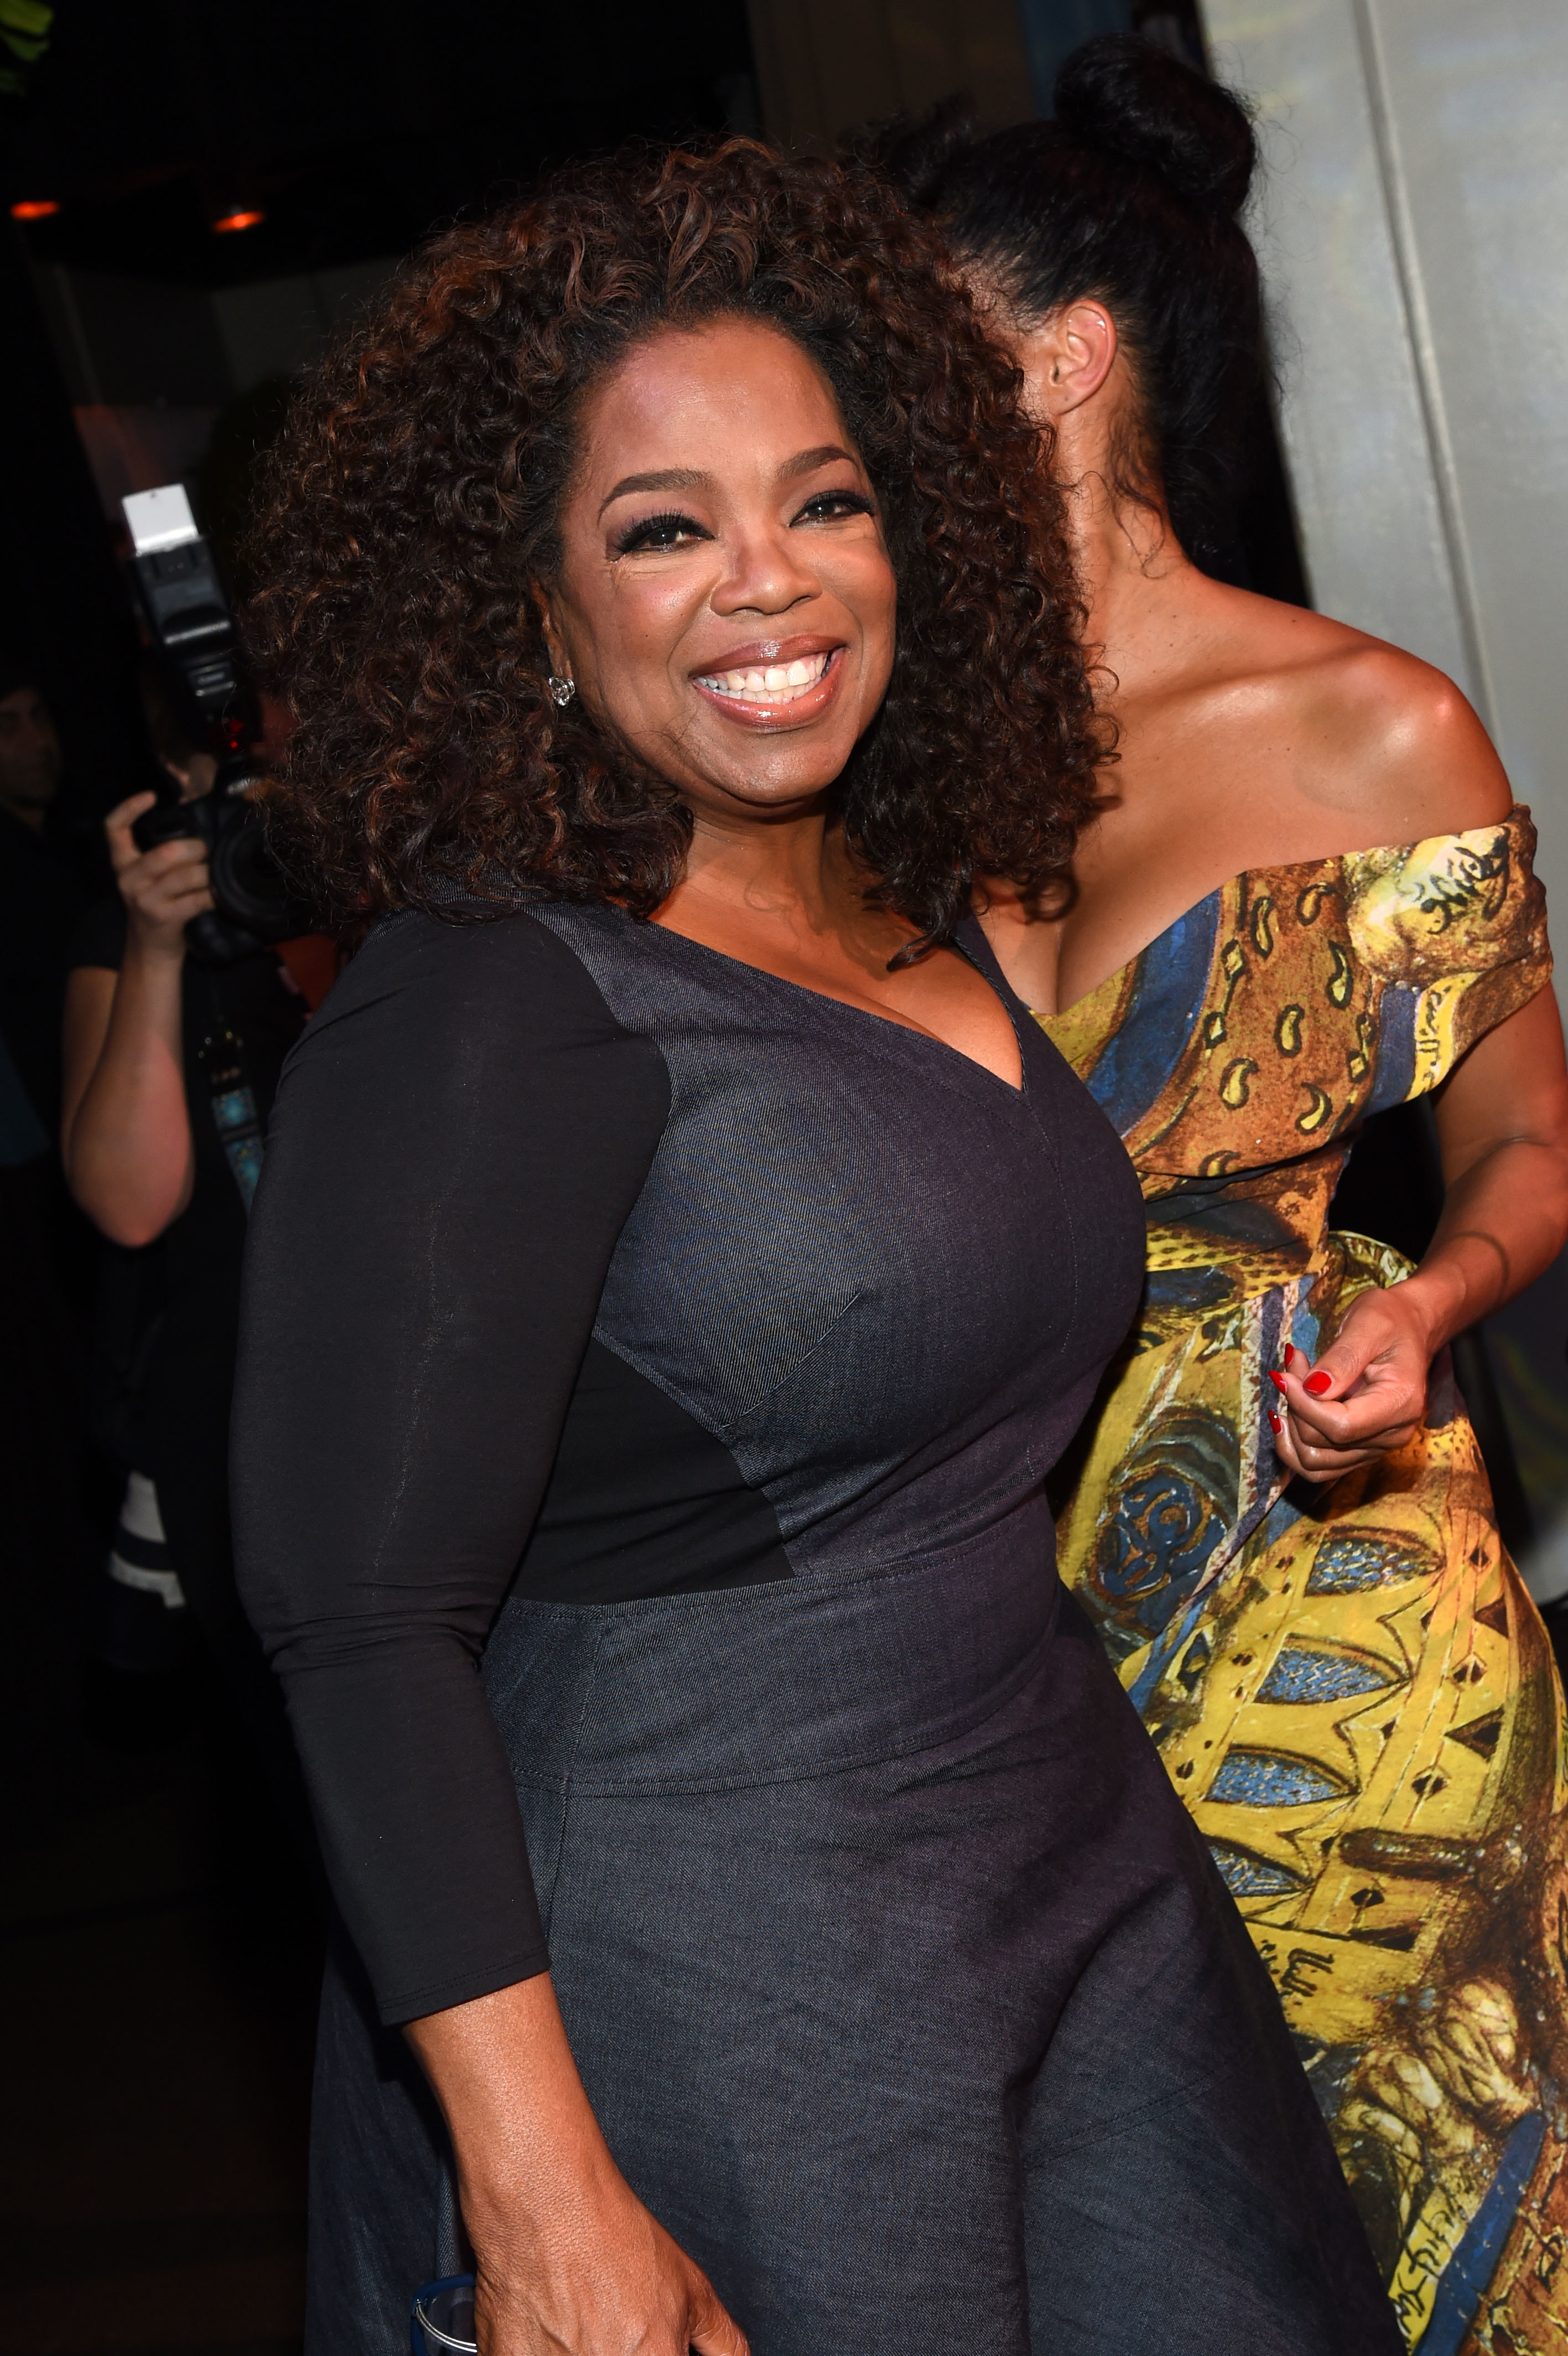 The academy seeks 'big name black presenters' to quell diversity debate